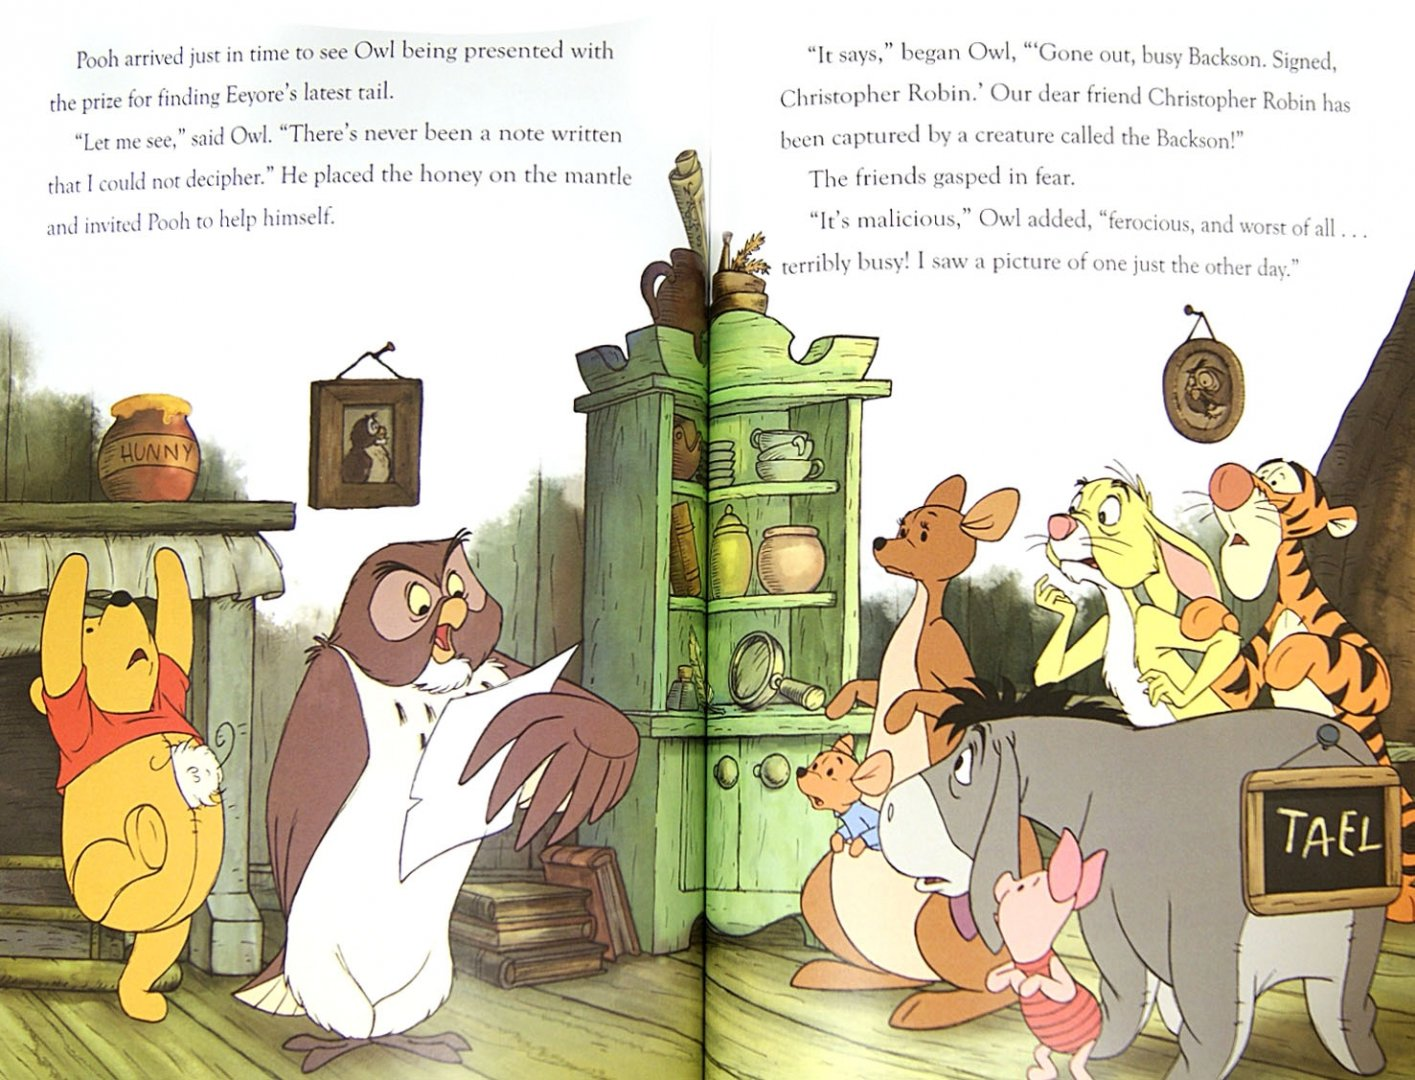 Иллюстрация 2 из 9 для Winnie the Pooh: Hundred-Acre-Wood Treasury - Lisa Marsoli   Лабиринт - книги. Источник: Лабиринт